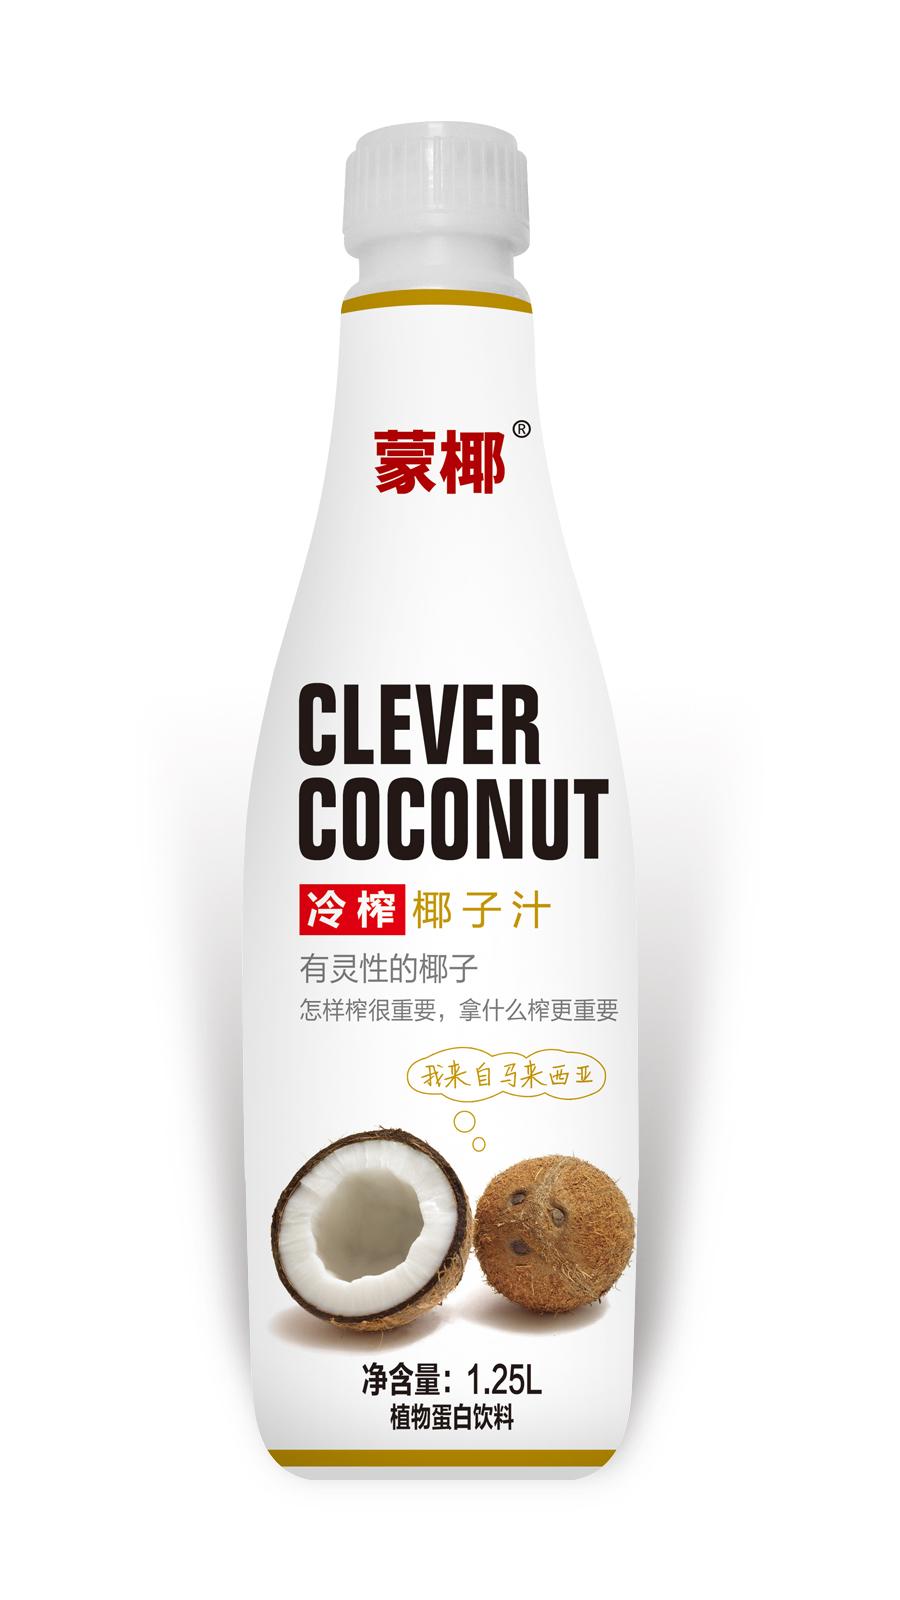 1.25L蒙椰 冷榨椰子汁